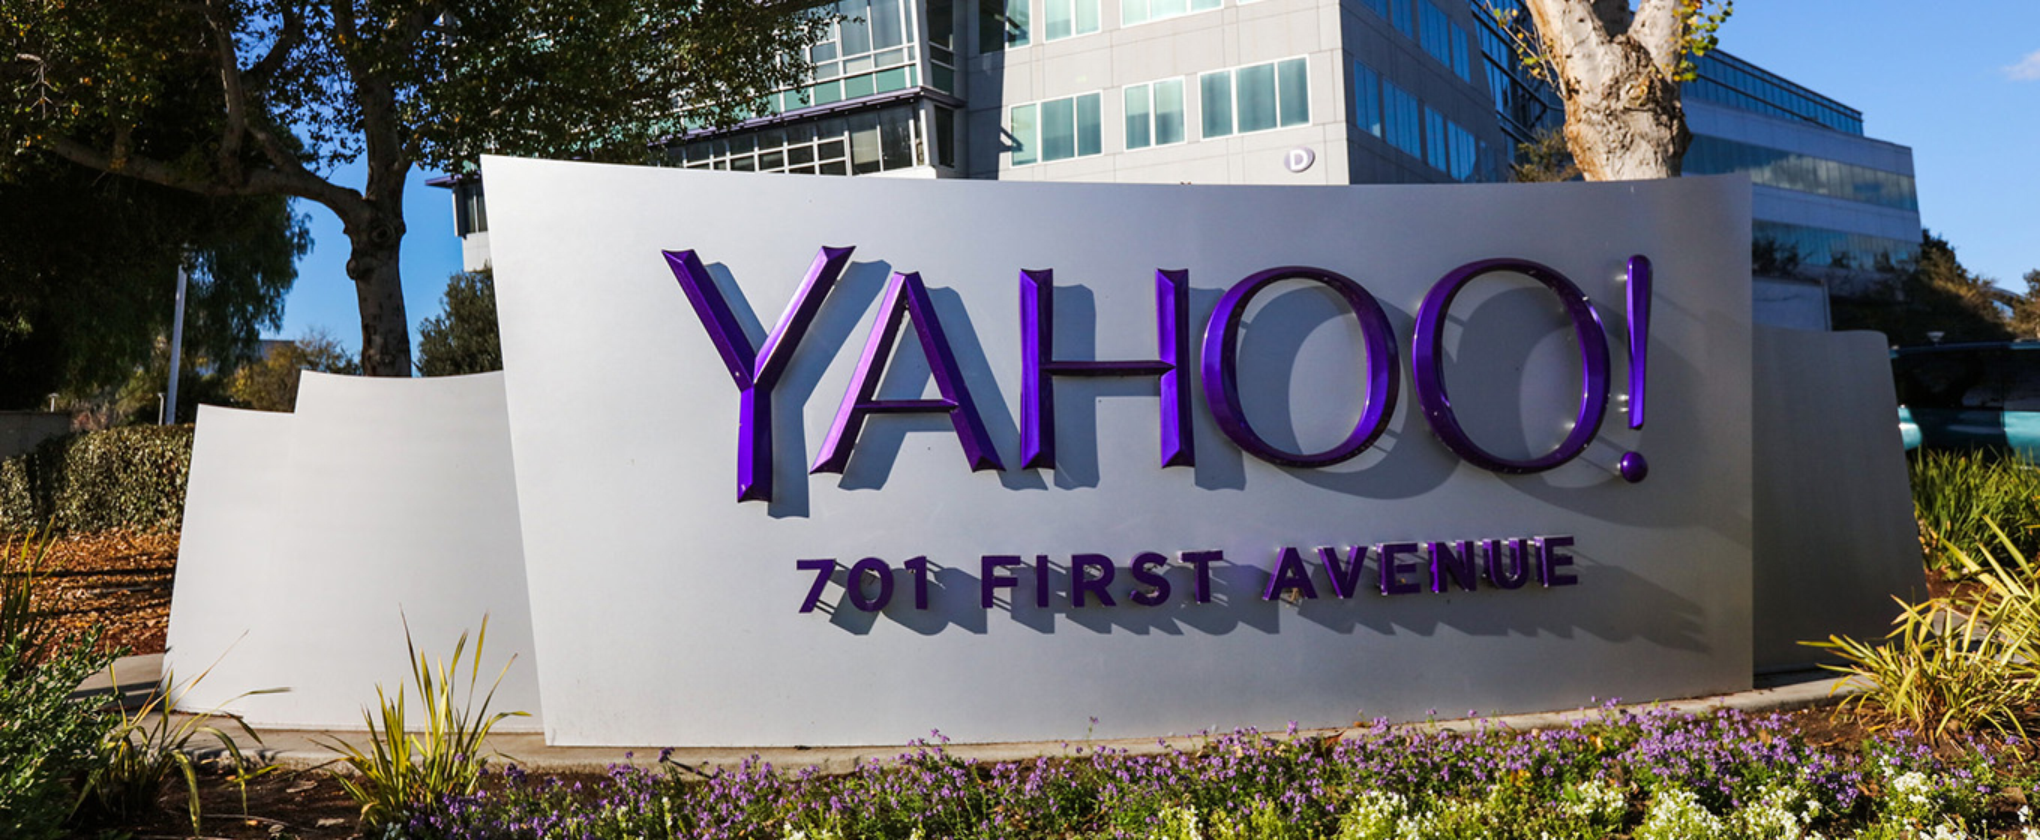 Verizon to Acquire Yahoo's Web Properties for $4.8 Billion